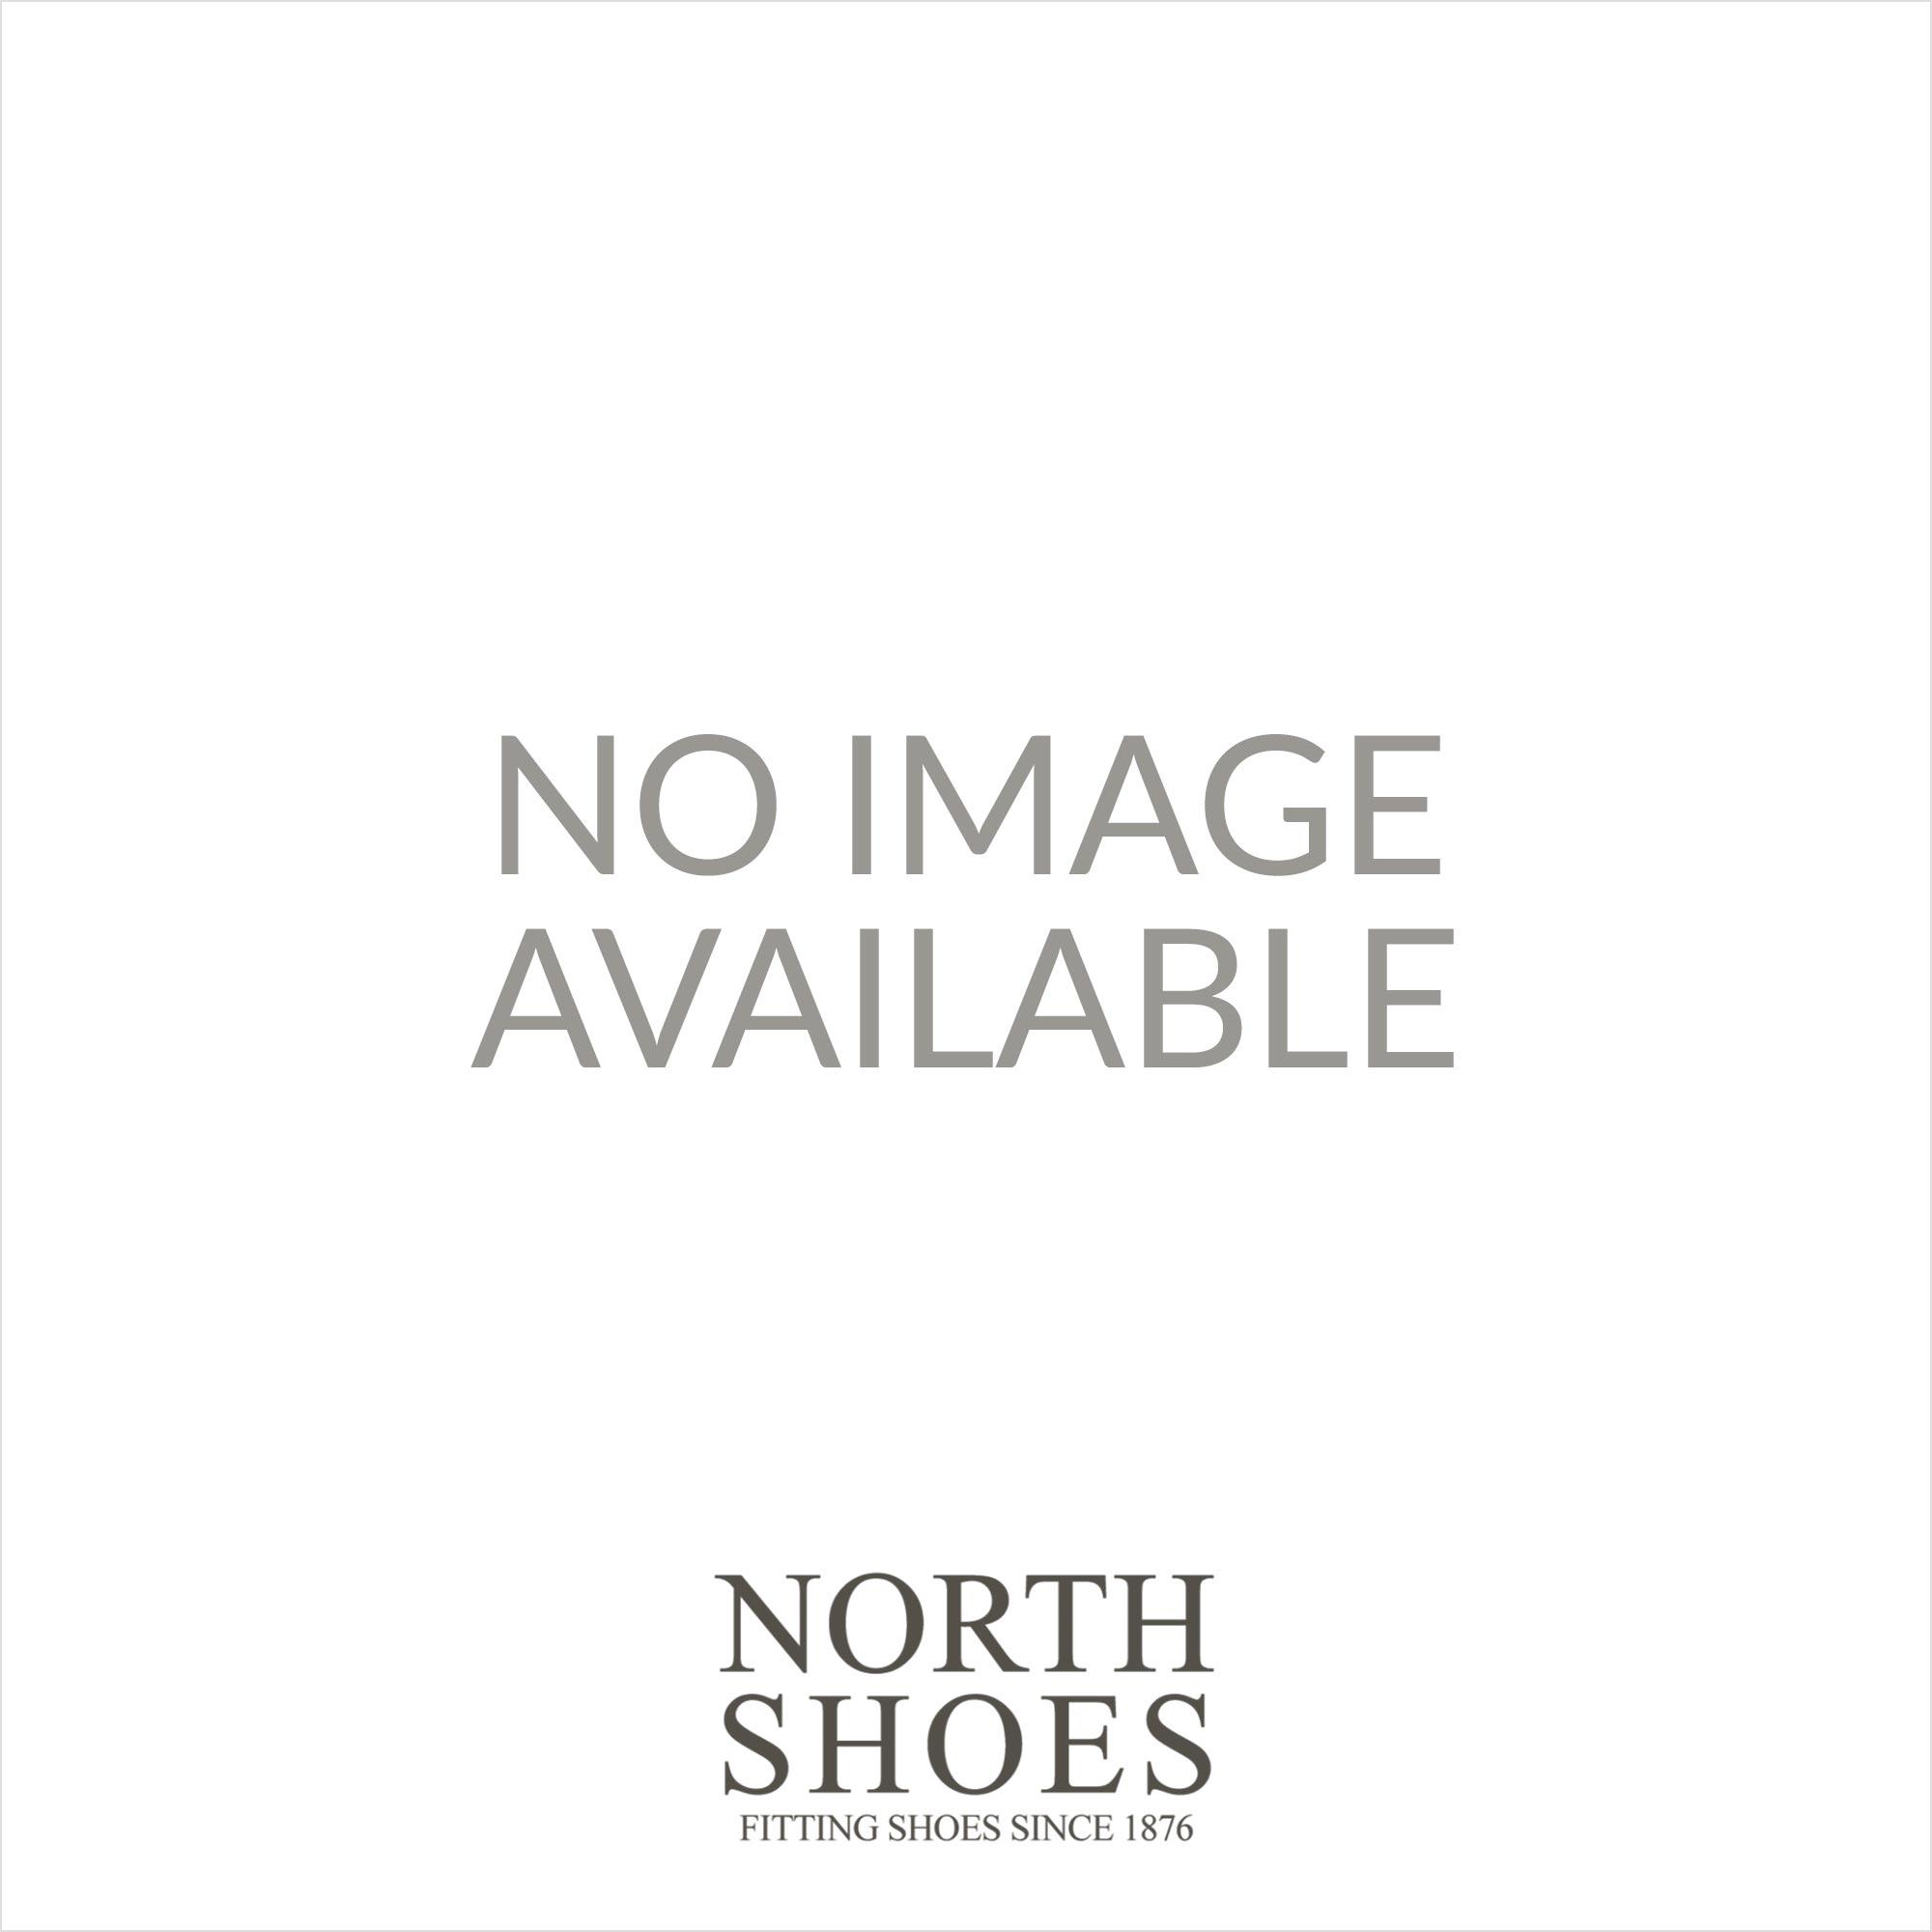 e237e2fc2ac2 Clarks Raffe Sun Tan Mens Sandal - Clarks from North Shoes UK